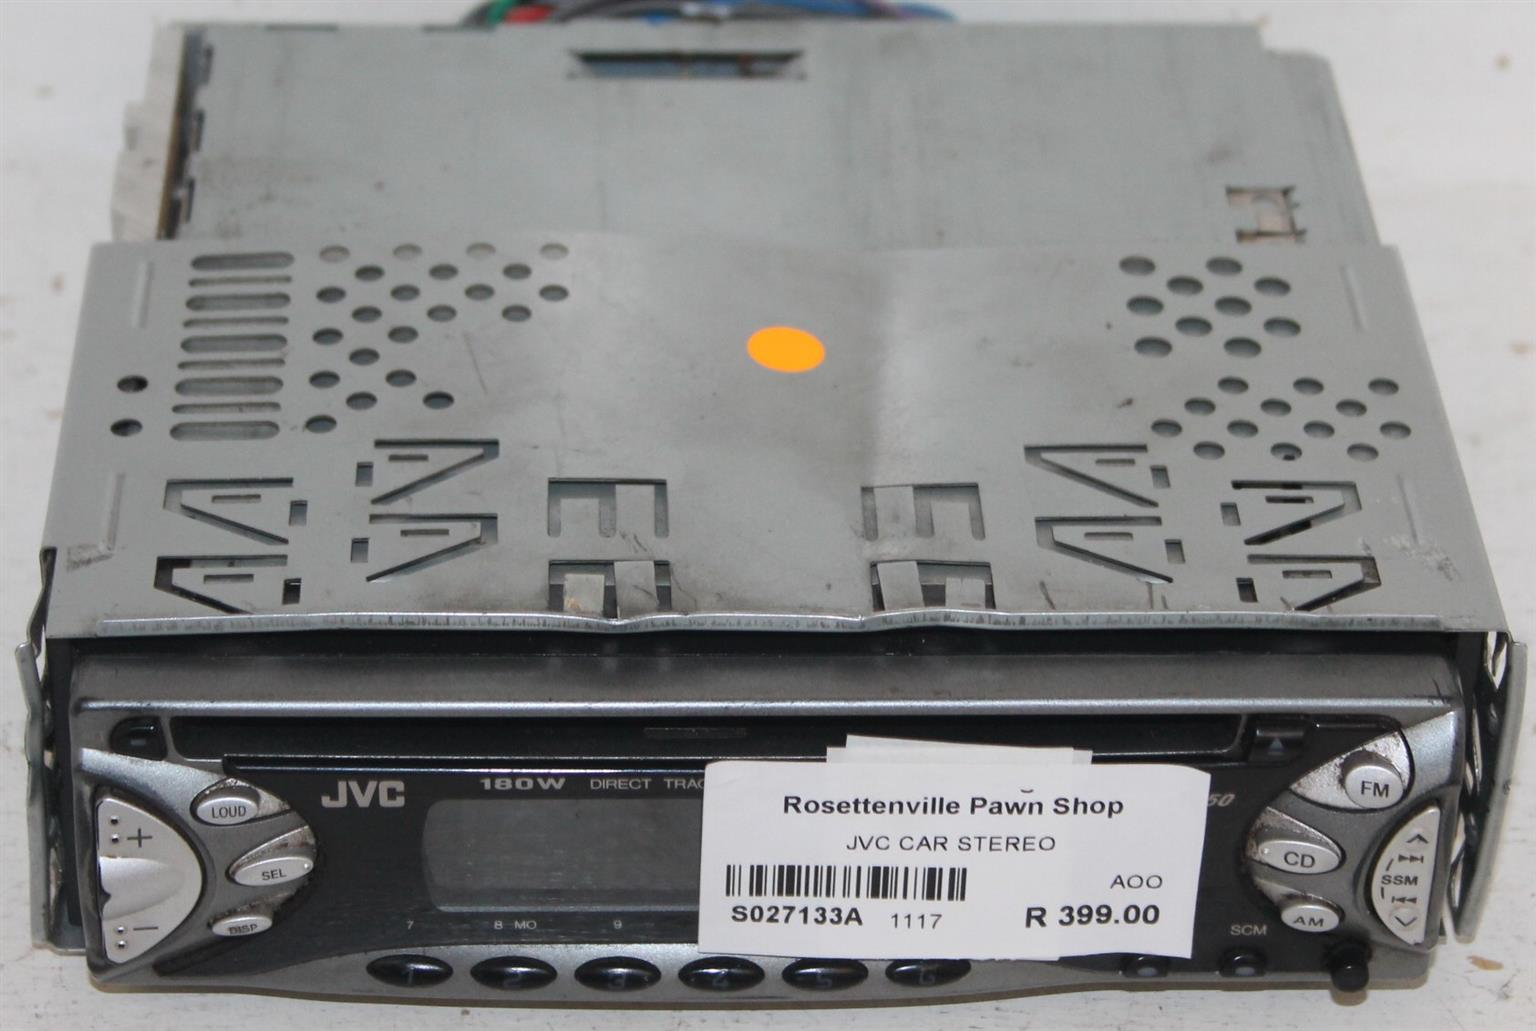 JVC car radio S027133a #Rosettenvillepawnshop